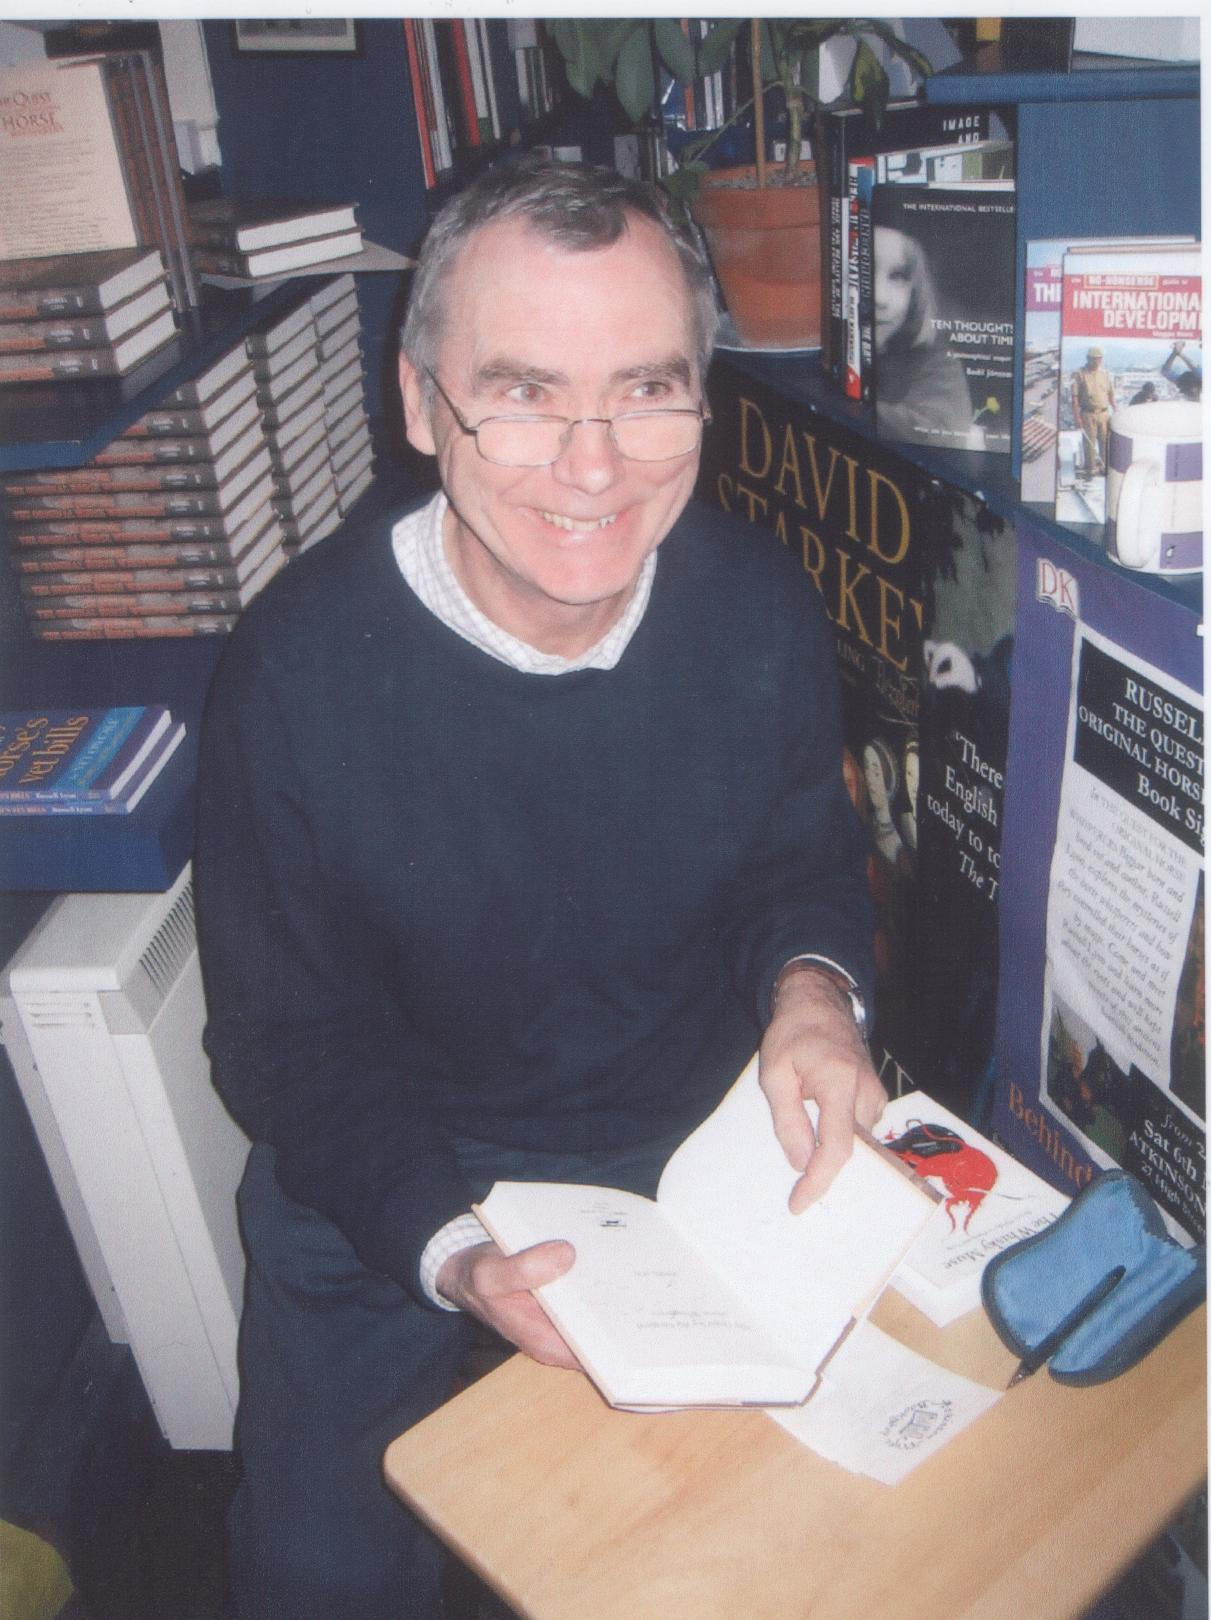 Russell Lyon